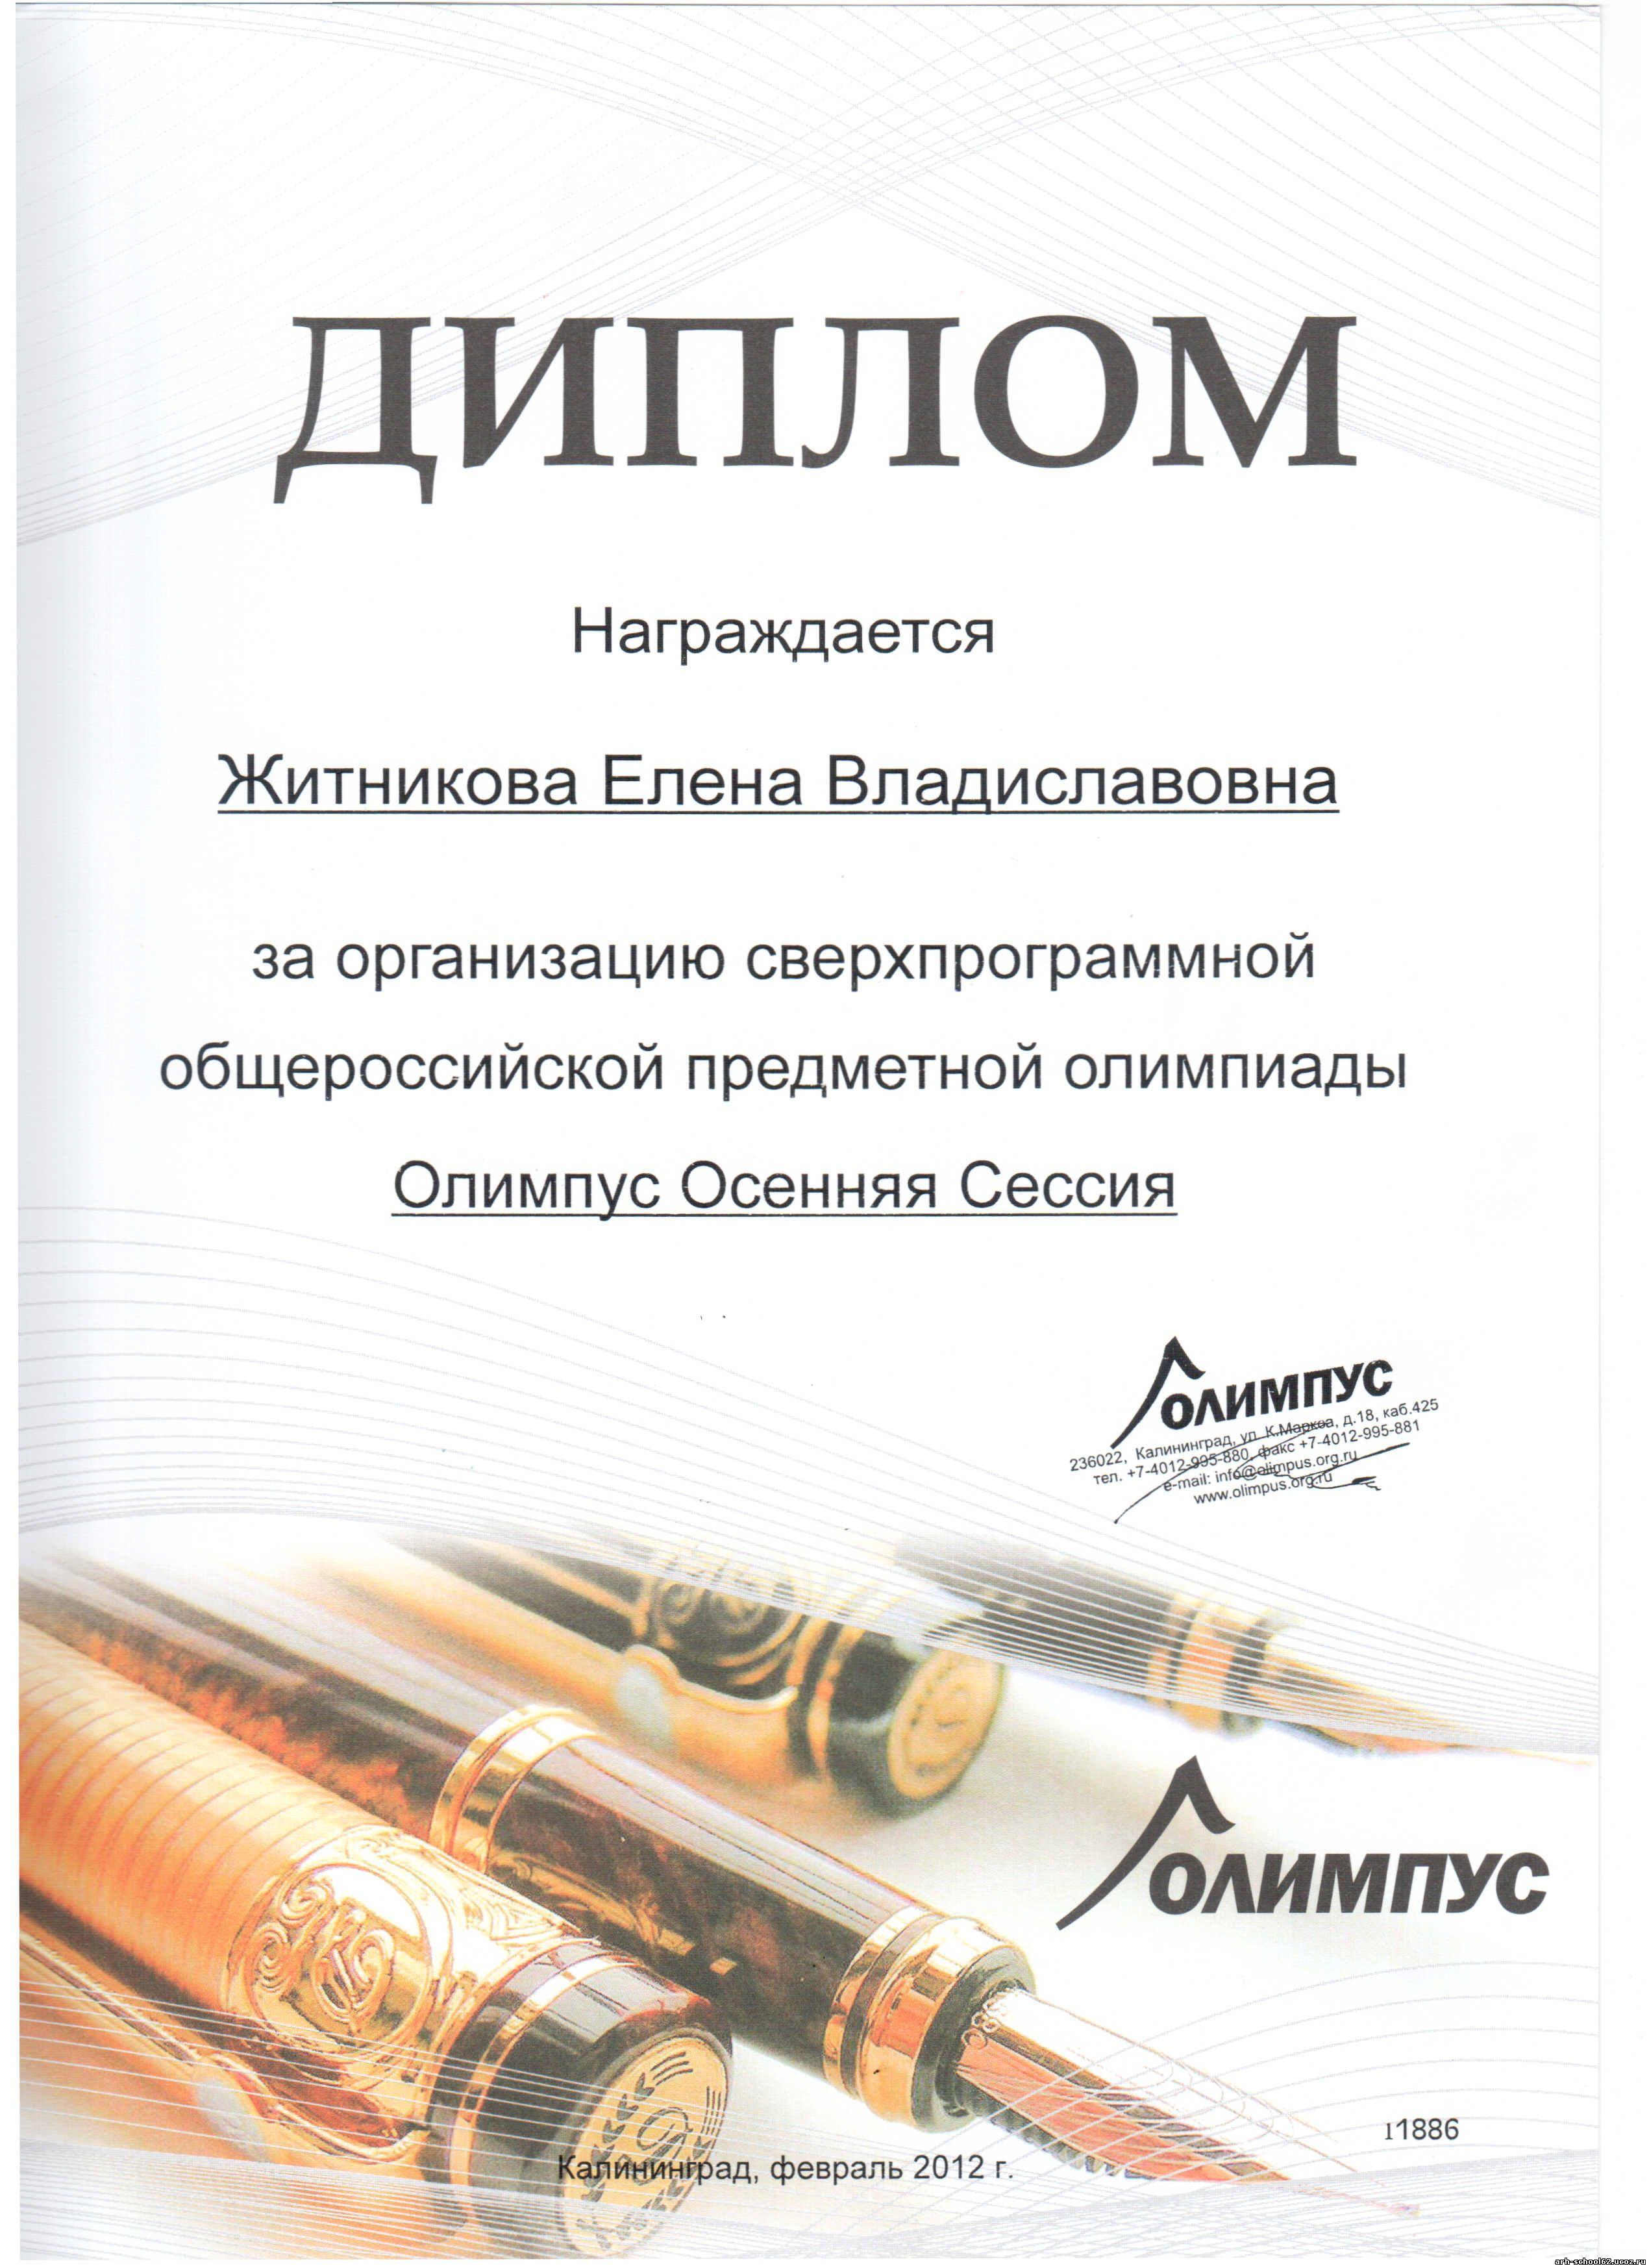 Олимпиада олимпус по русскому языку осенняя сессия 2018 6 класс